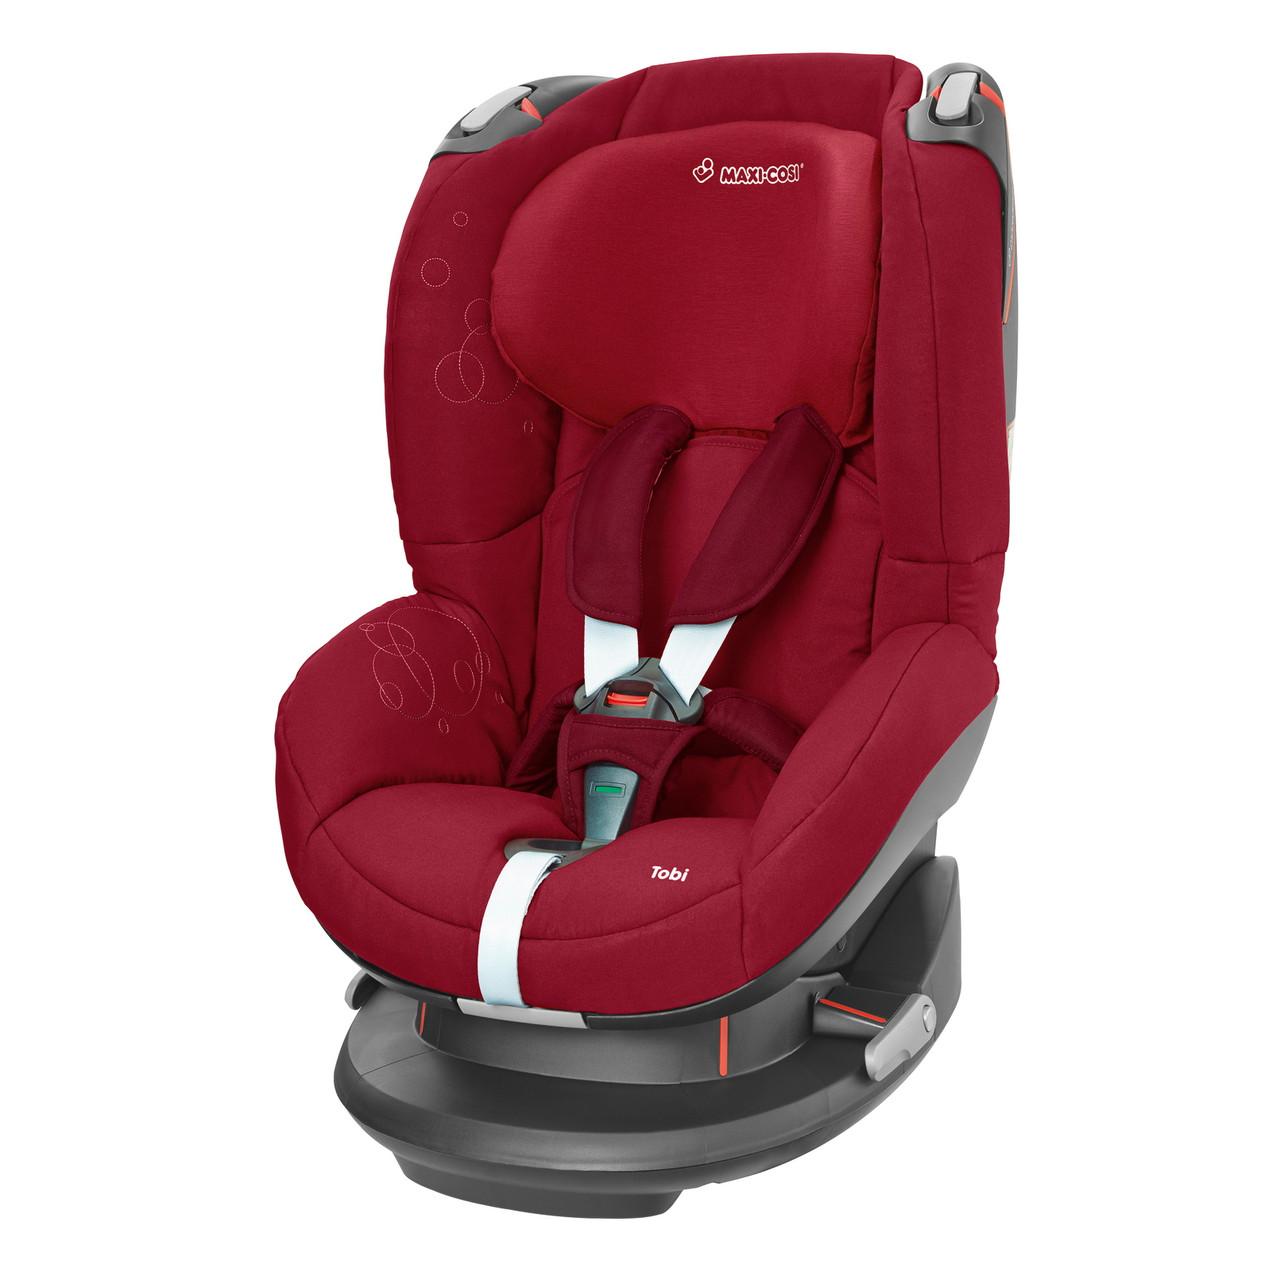 Автокресло Maxi Cosi Tobi 9-18 кг (60108140) Raspberry Red (тёмно-красный)